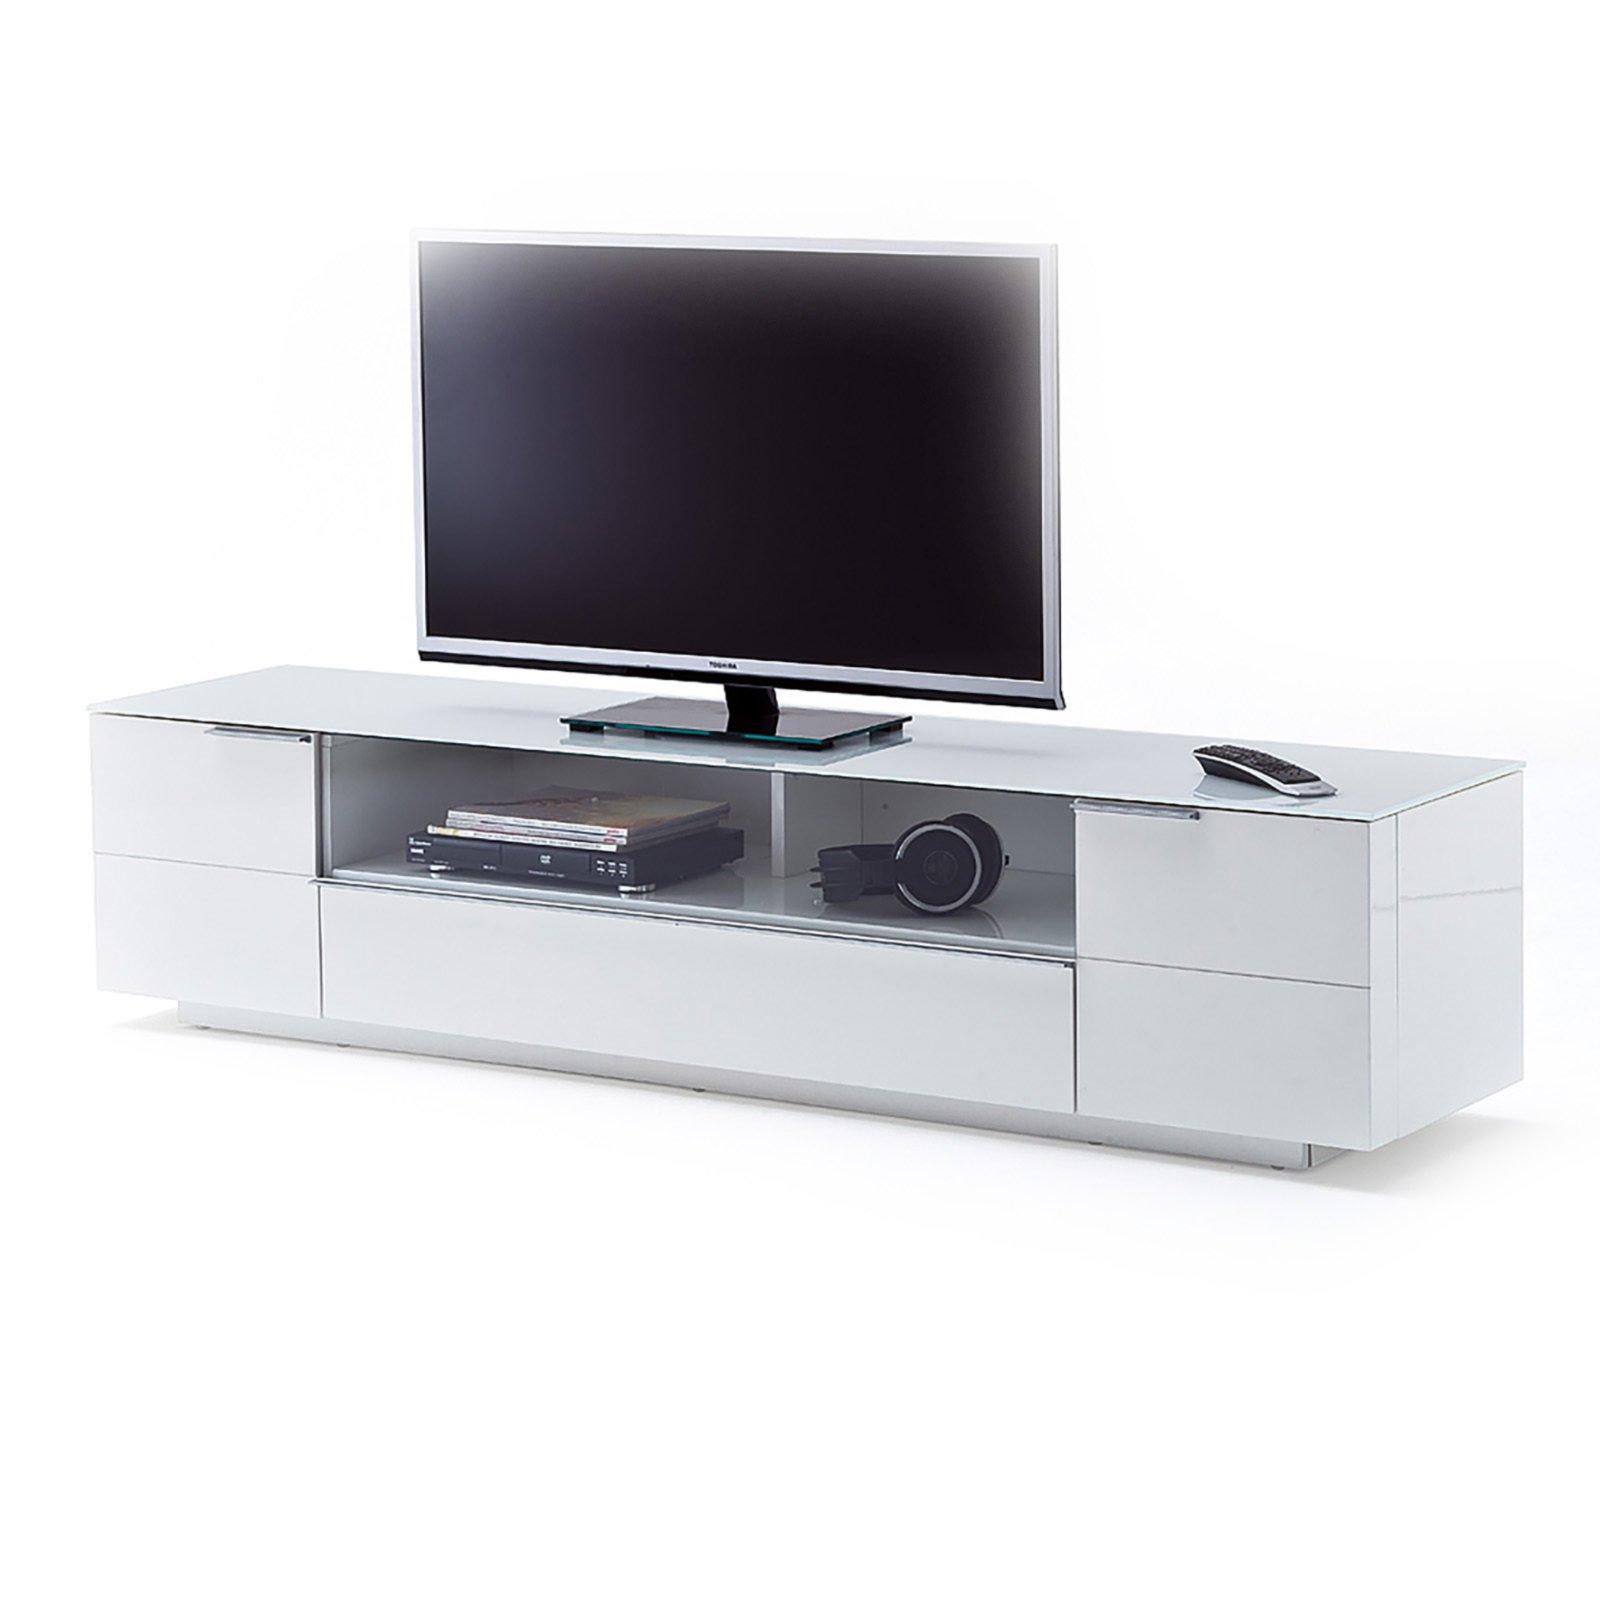 tv lowboard canberra wei hochglanz ebay. Black Bedroom Furniture Sets. Home Design Ideas